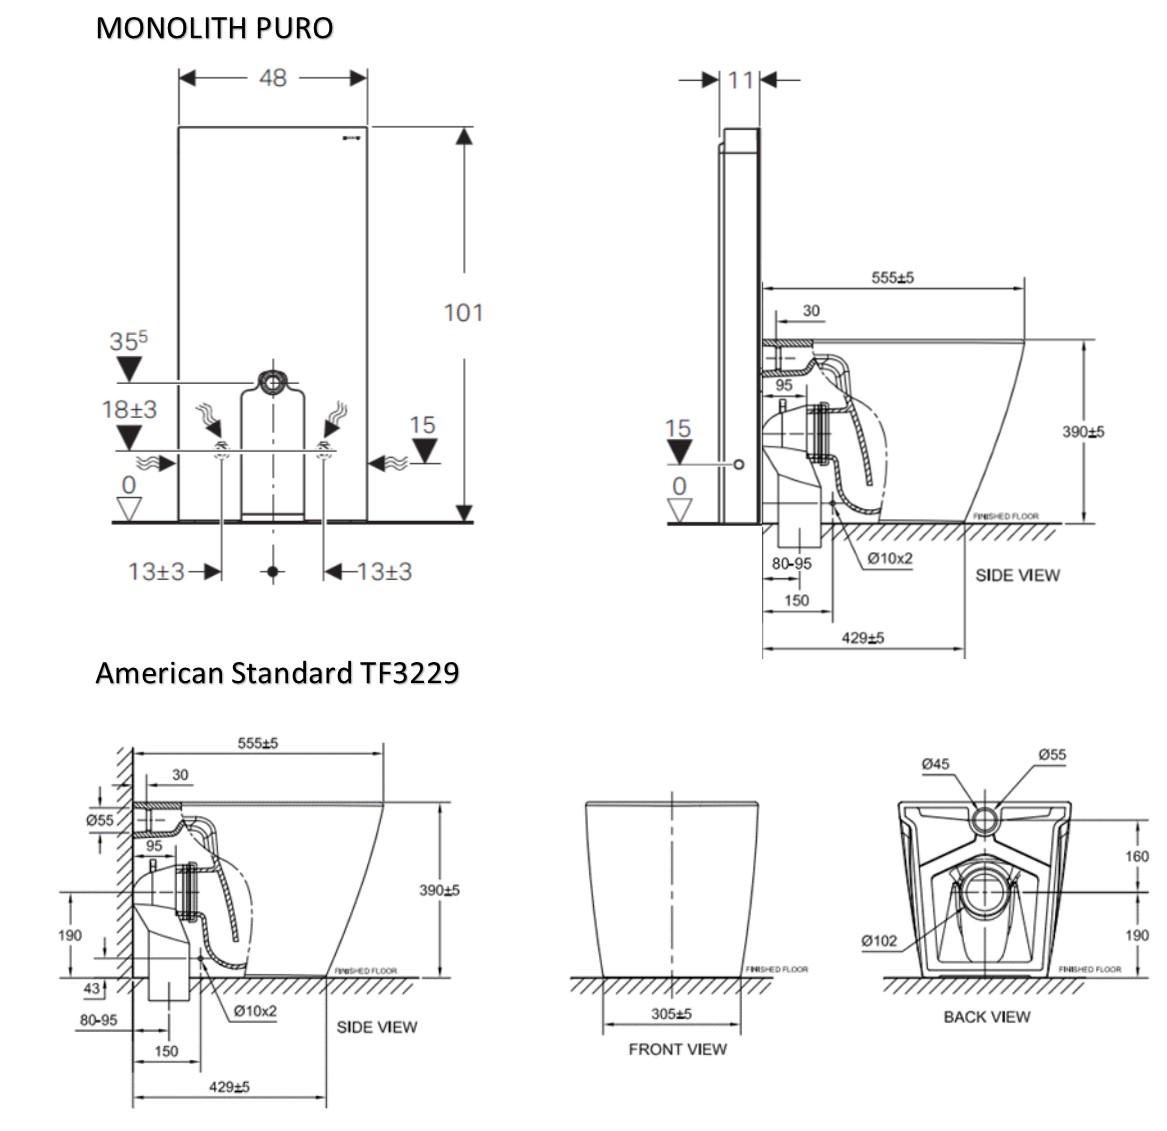 American Standard Tf3229 With Geberit Monolith Black Bacera